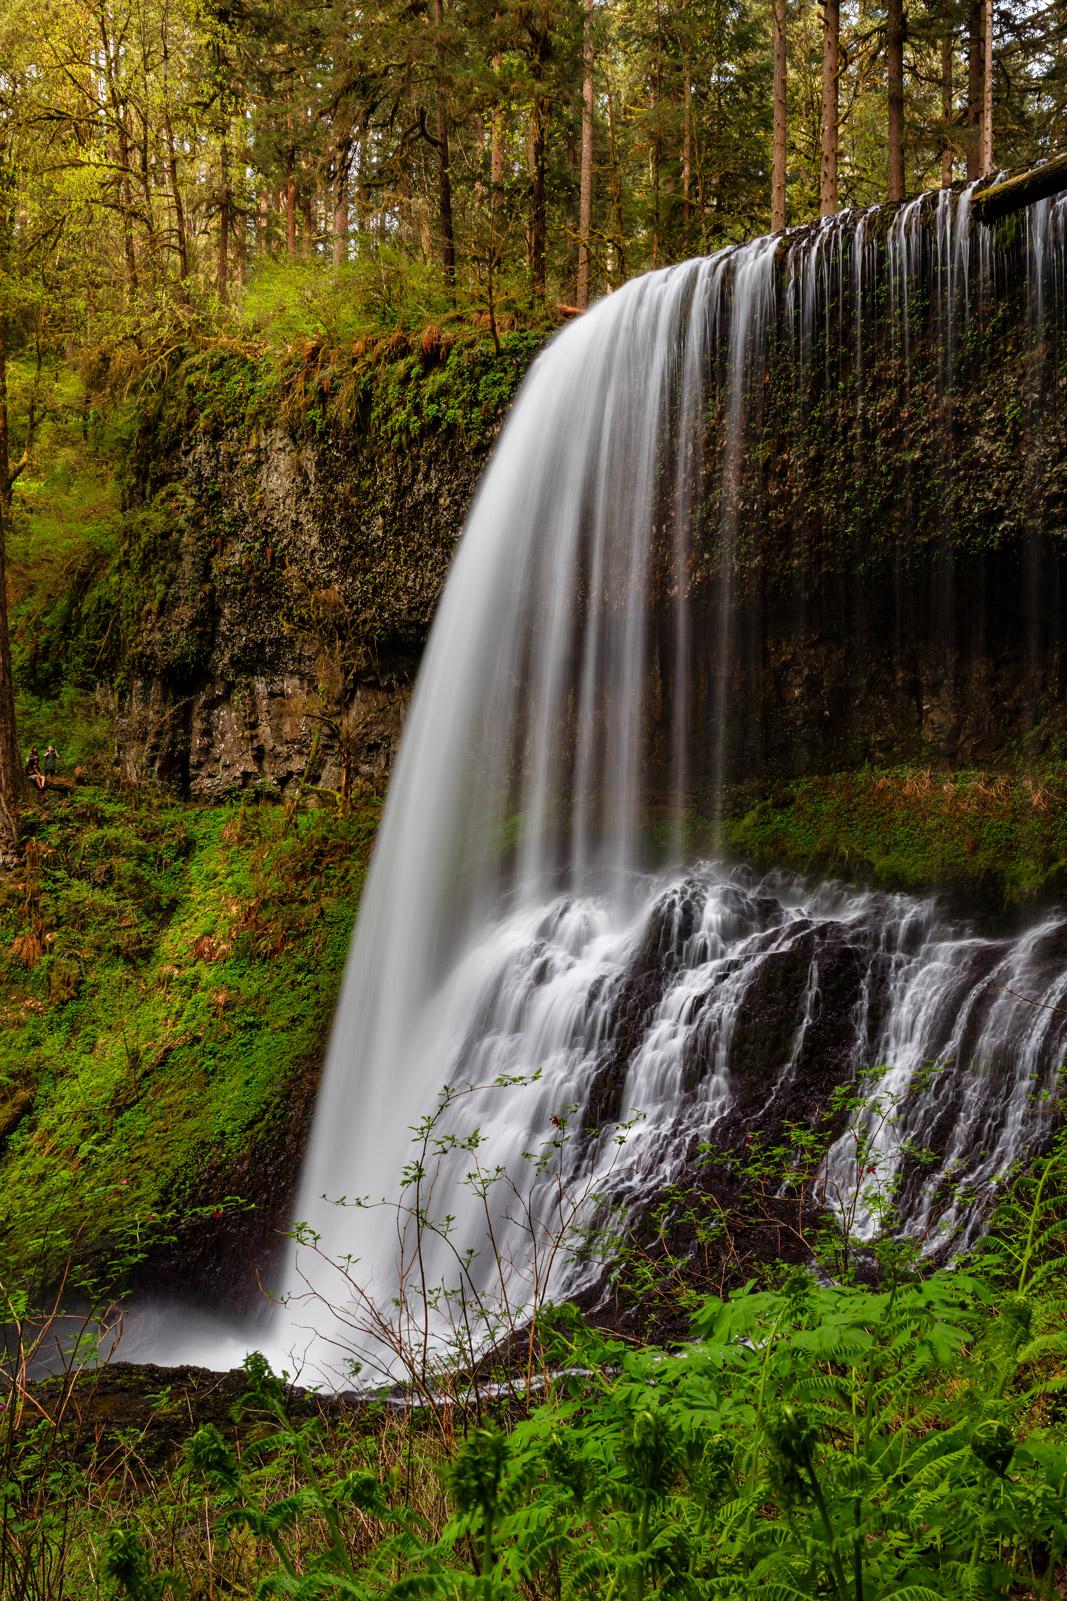 Oregon, North Falls, Silver Falls, Waterfall, Middle North Falls, photo